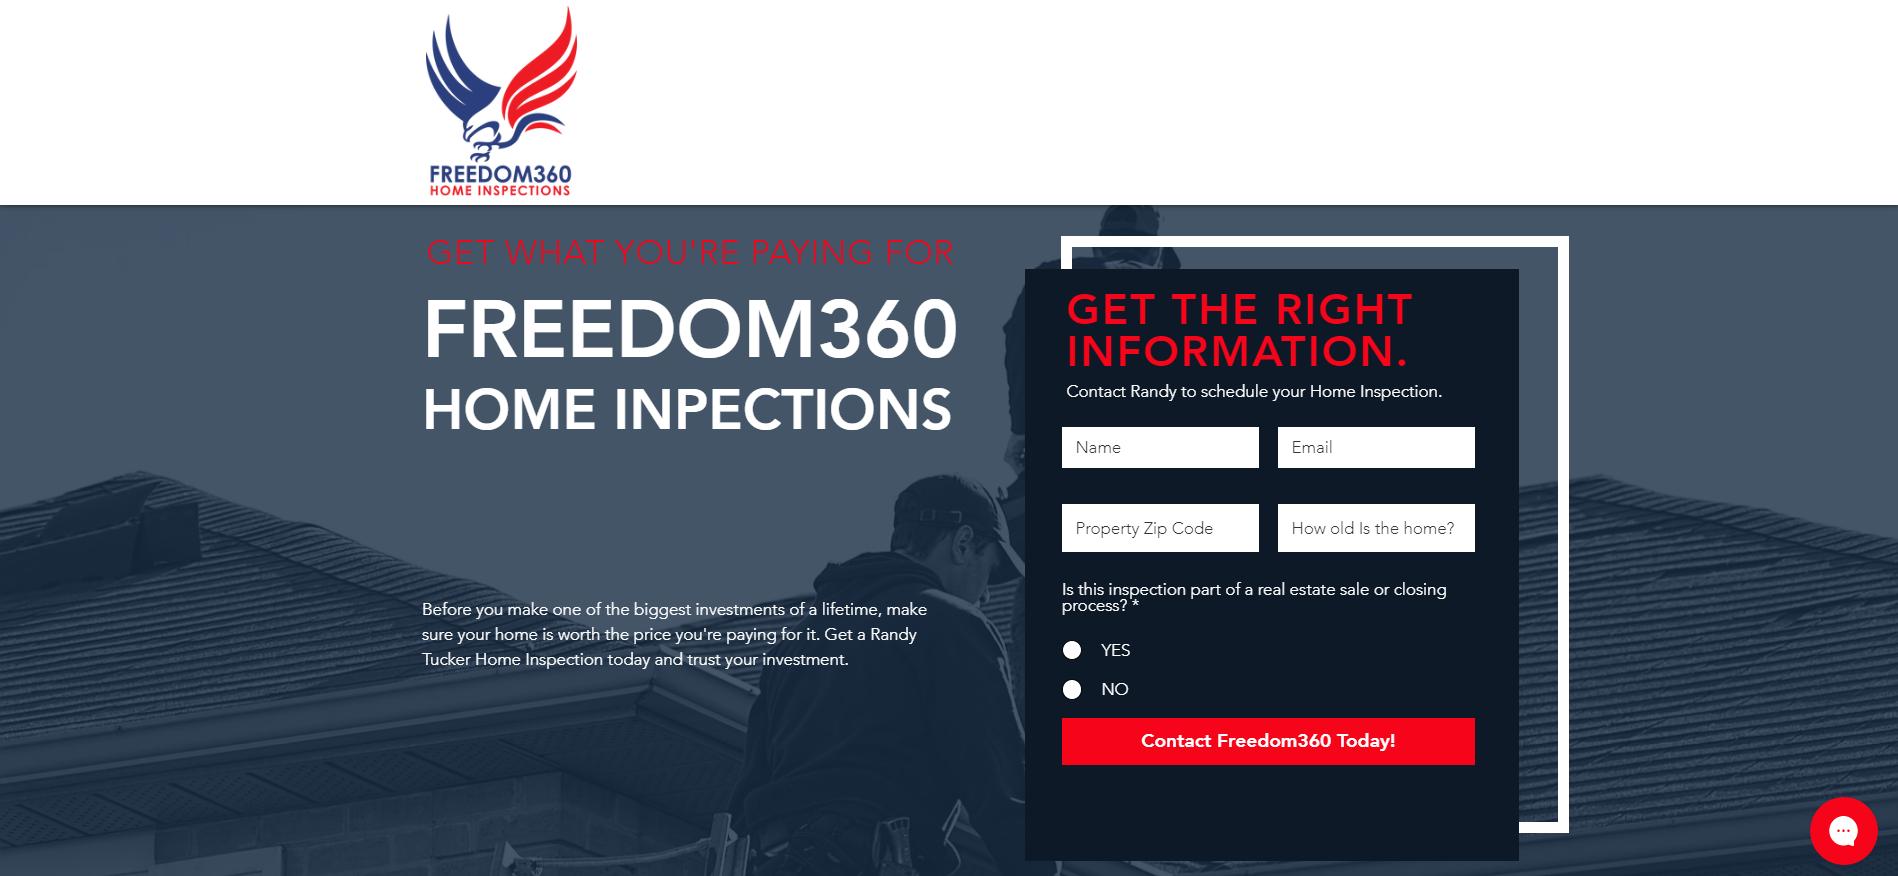 freedom360